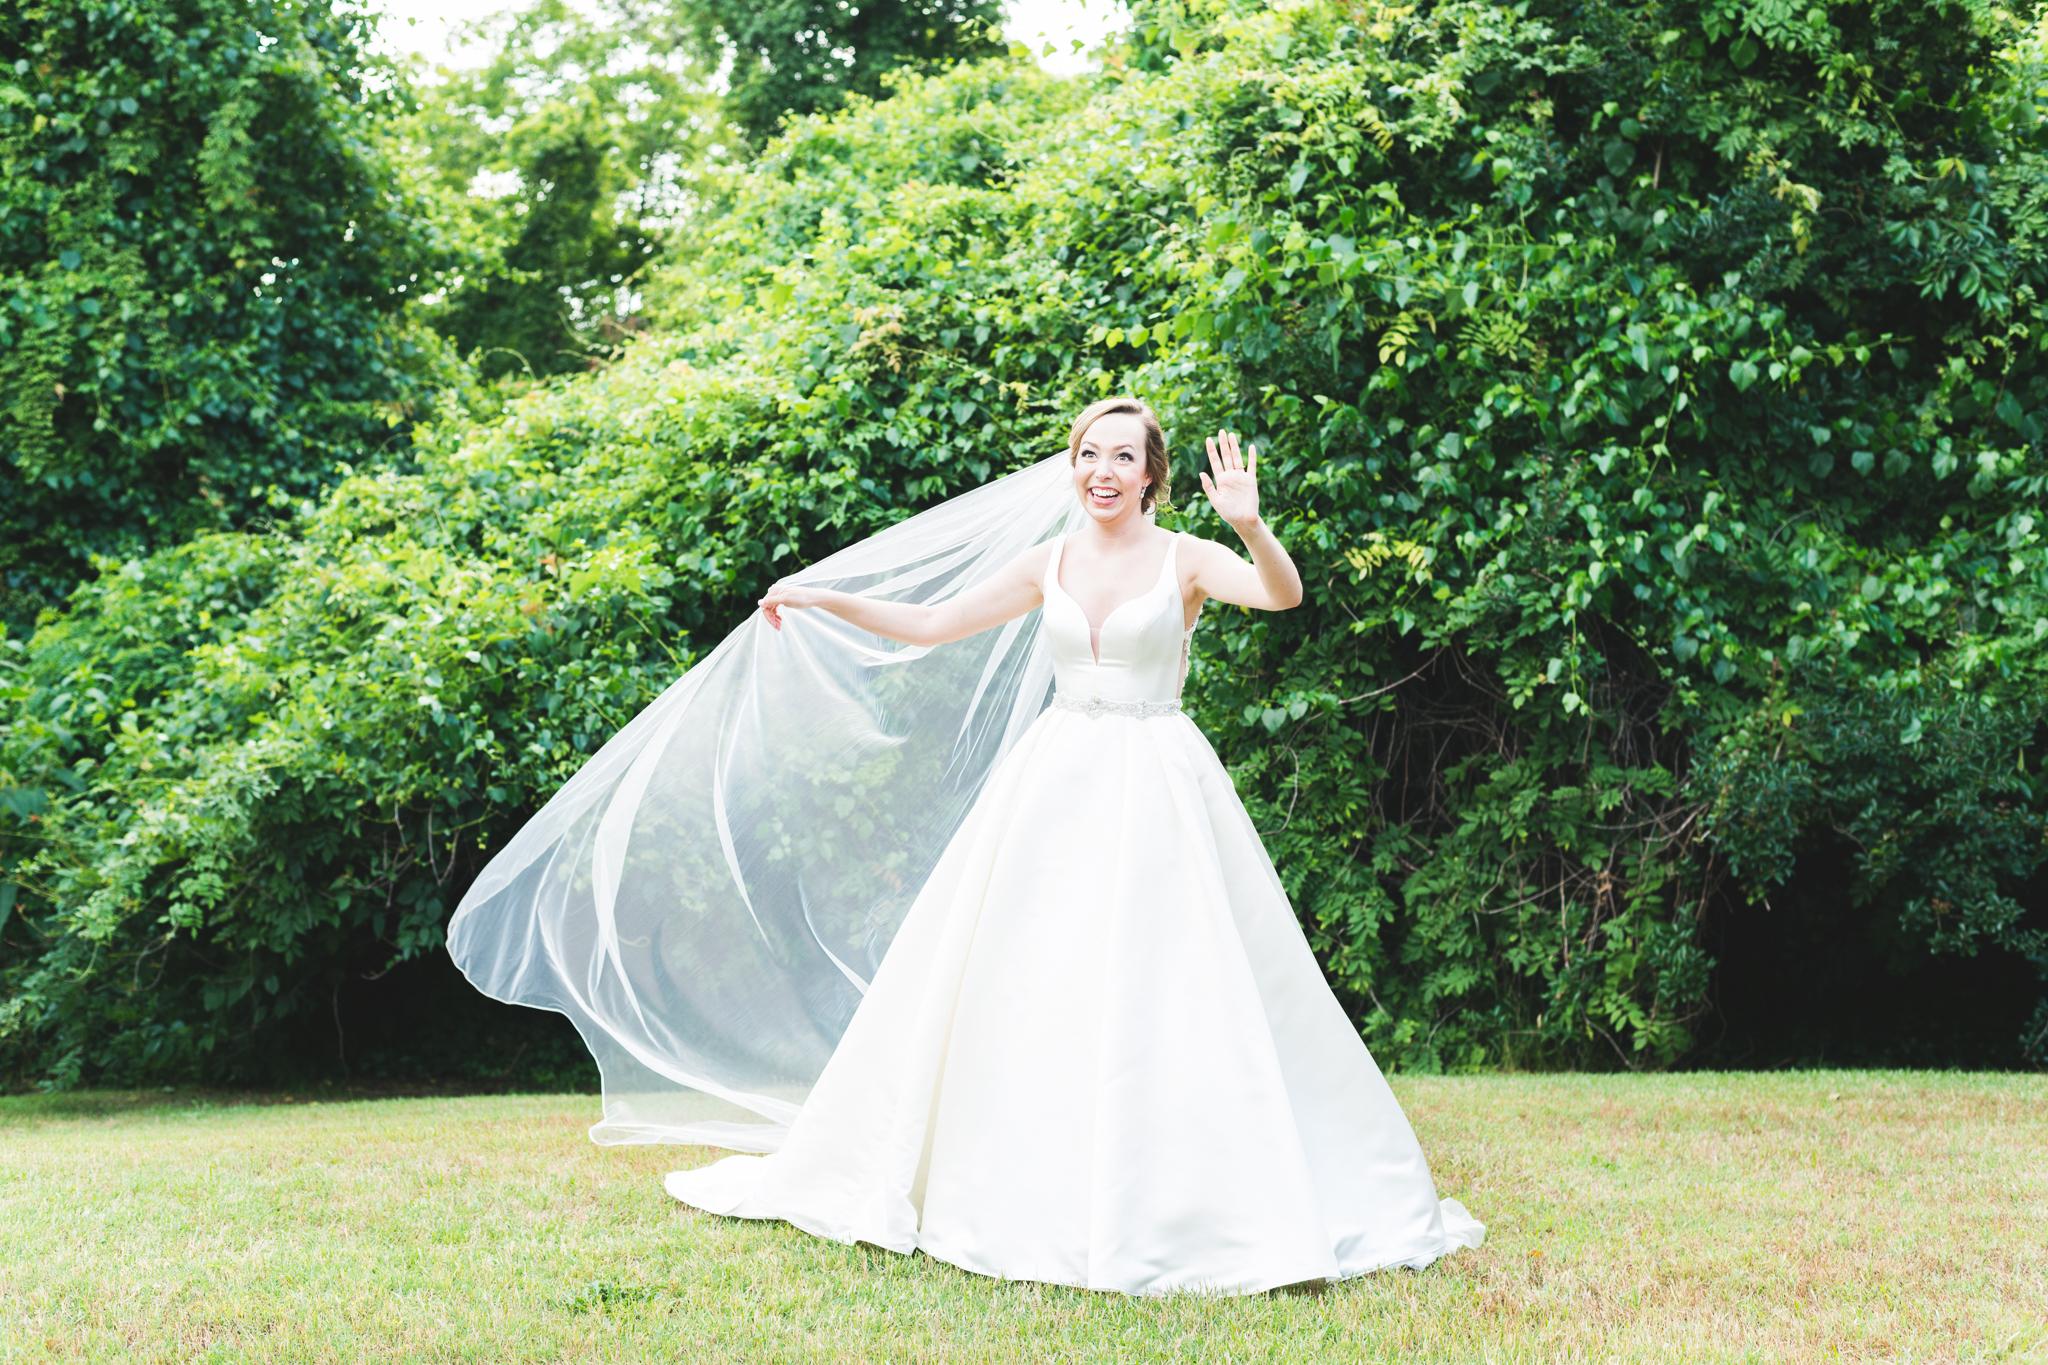 Bridals_MadisonReke_Blog-10.jpg